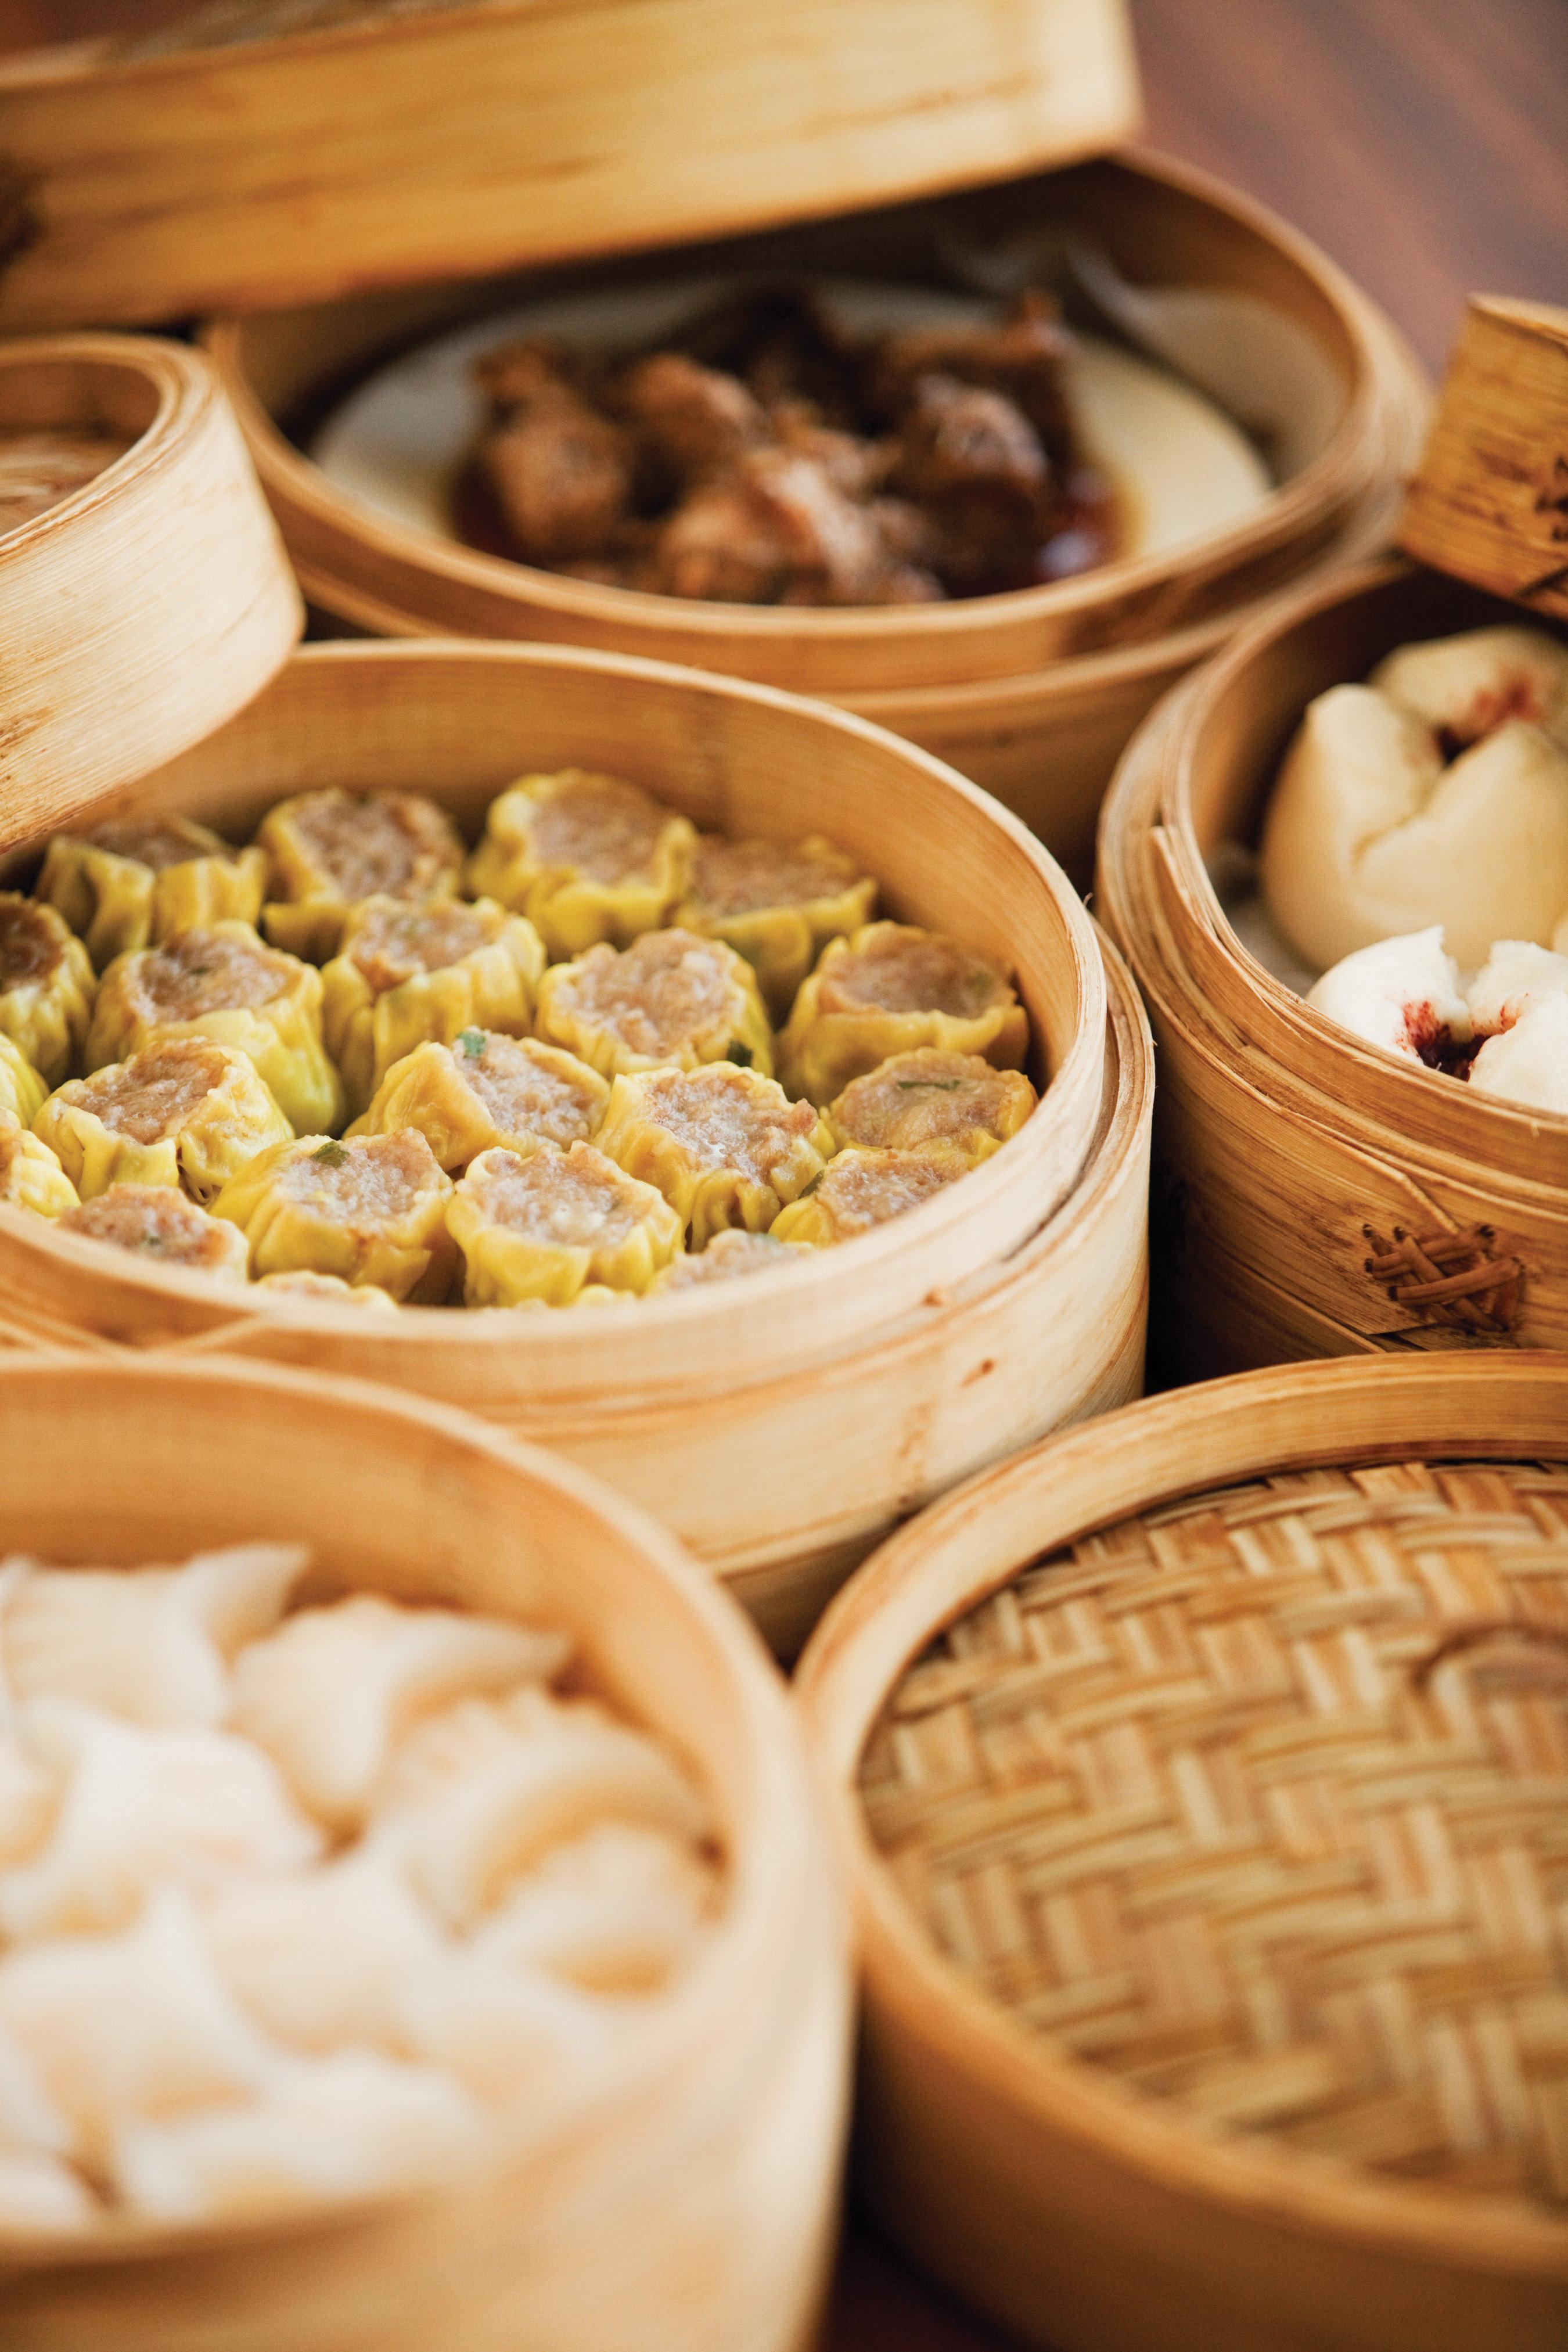 Bar Dining Drink Eat Luxury food cuisine asian food chinese food dim sum fruit flavor vegetable